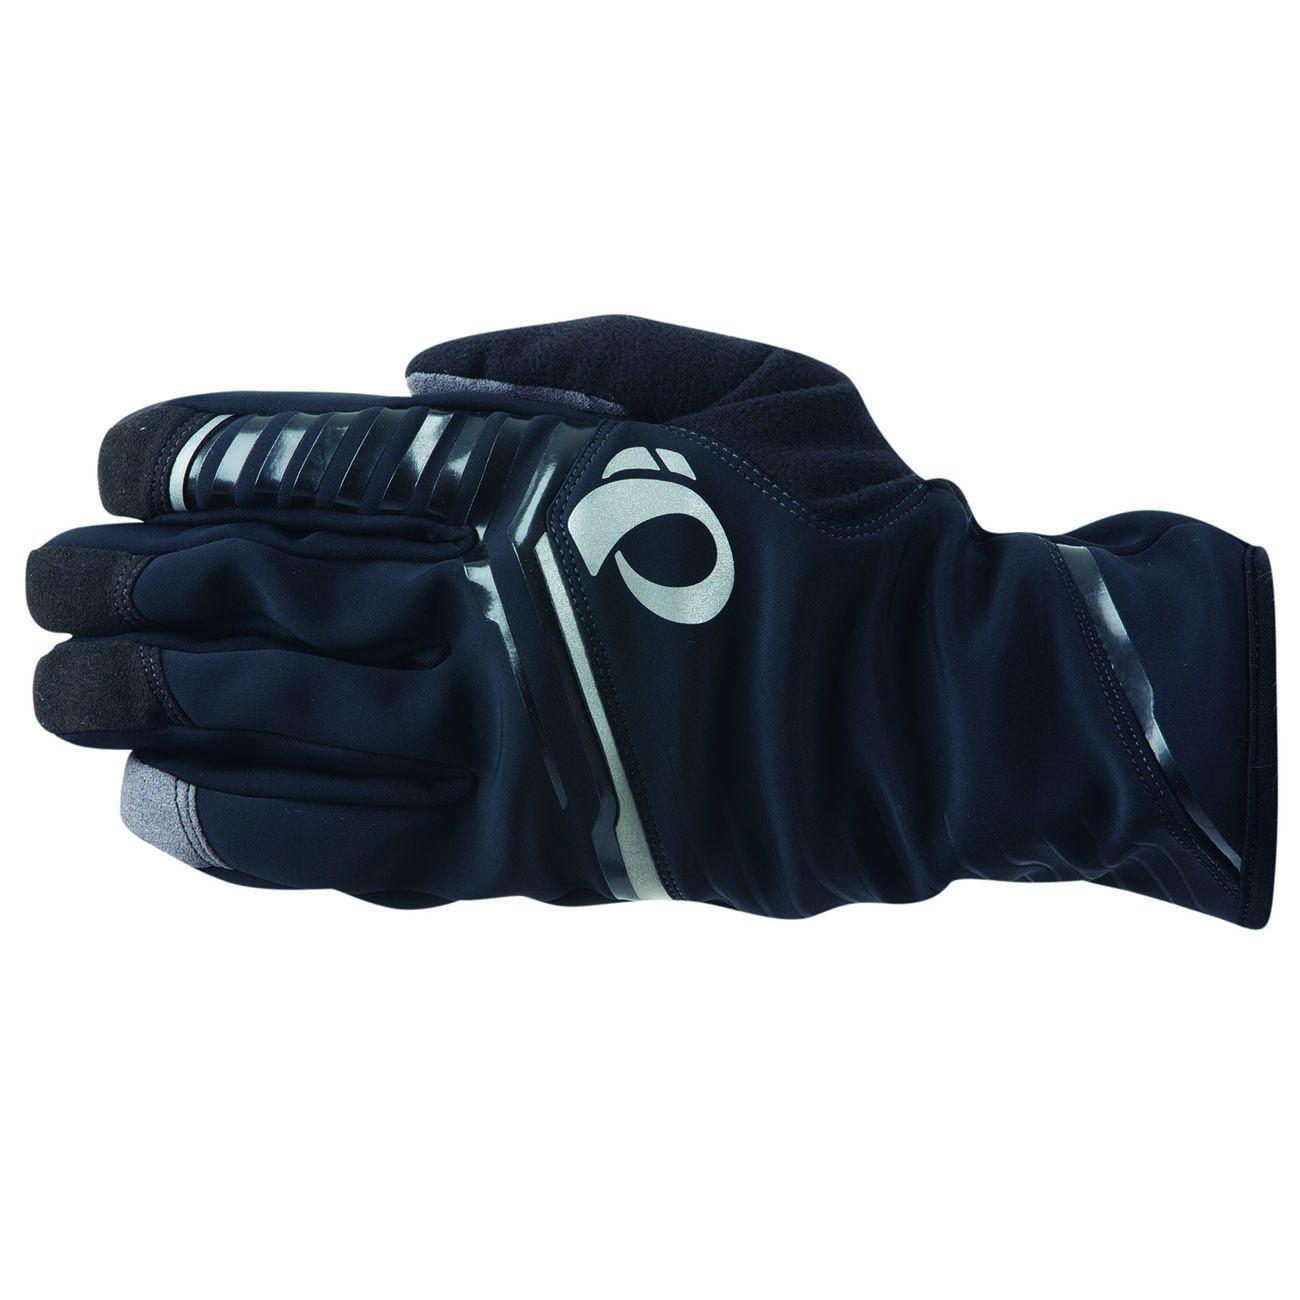 PEARL iZUMi PRO AMFIB rukavice, černá, XL